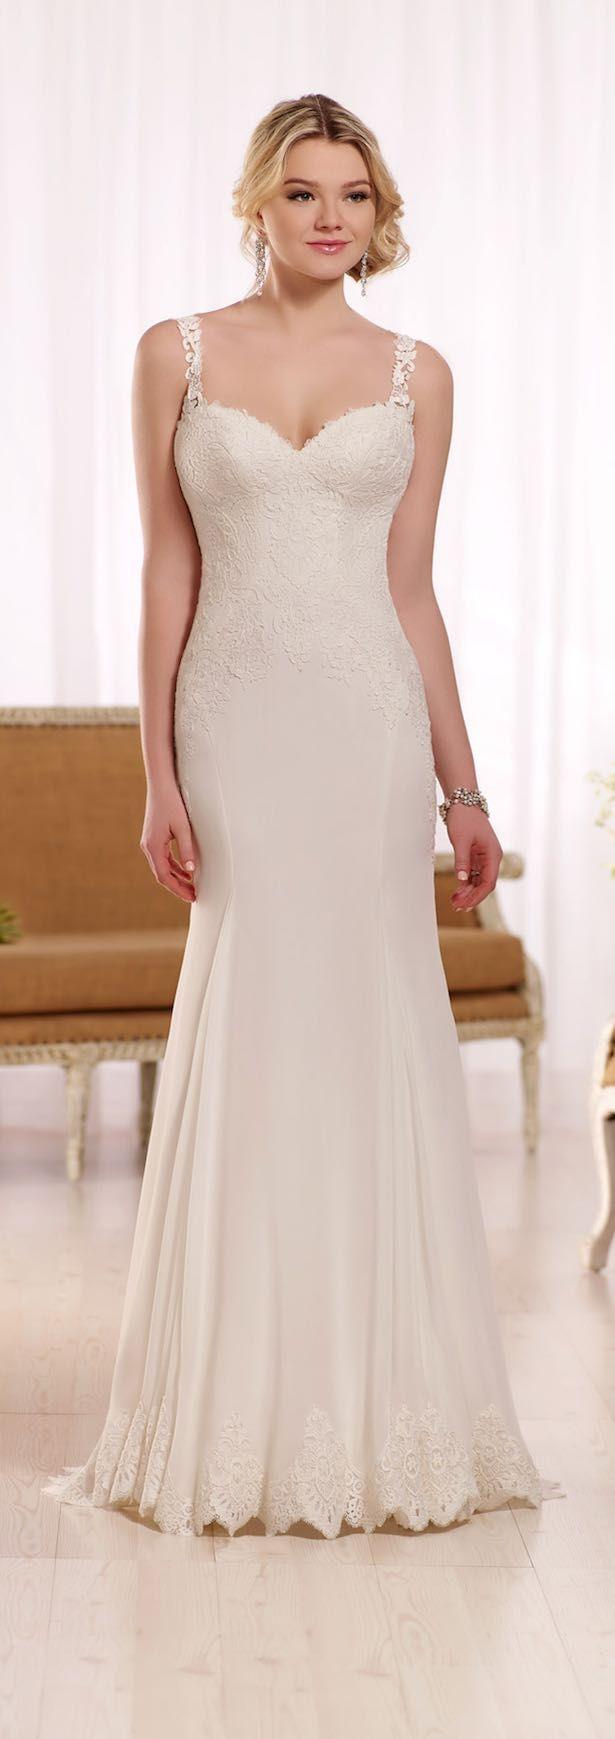 Essense wedding dress  Essense of Australia Fall    wedding dresses Australia and